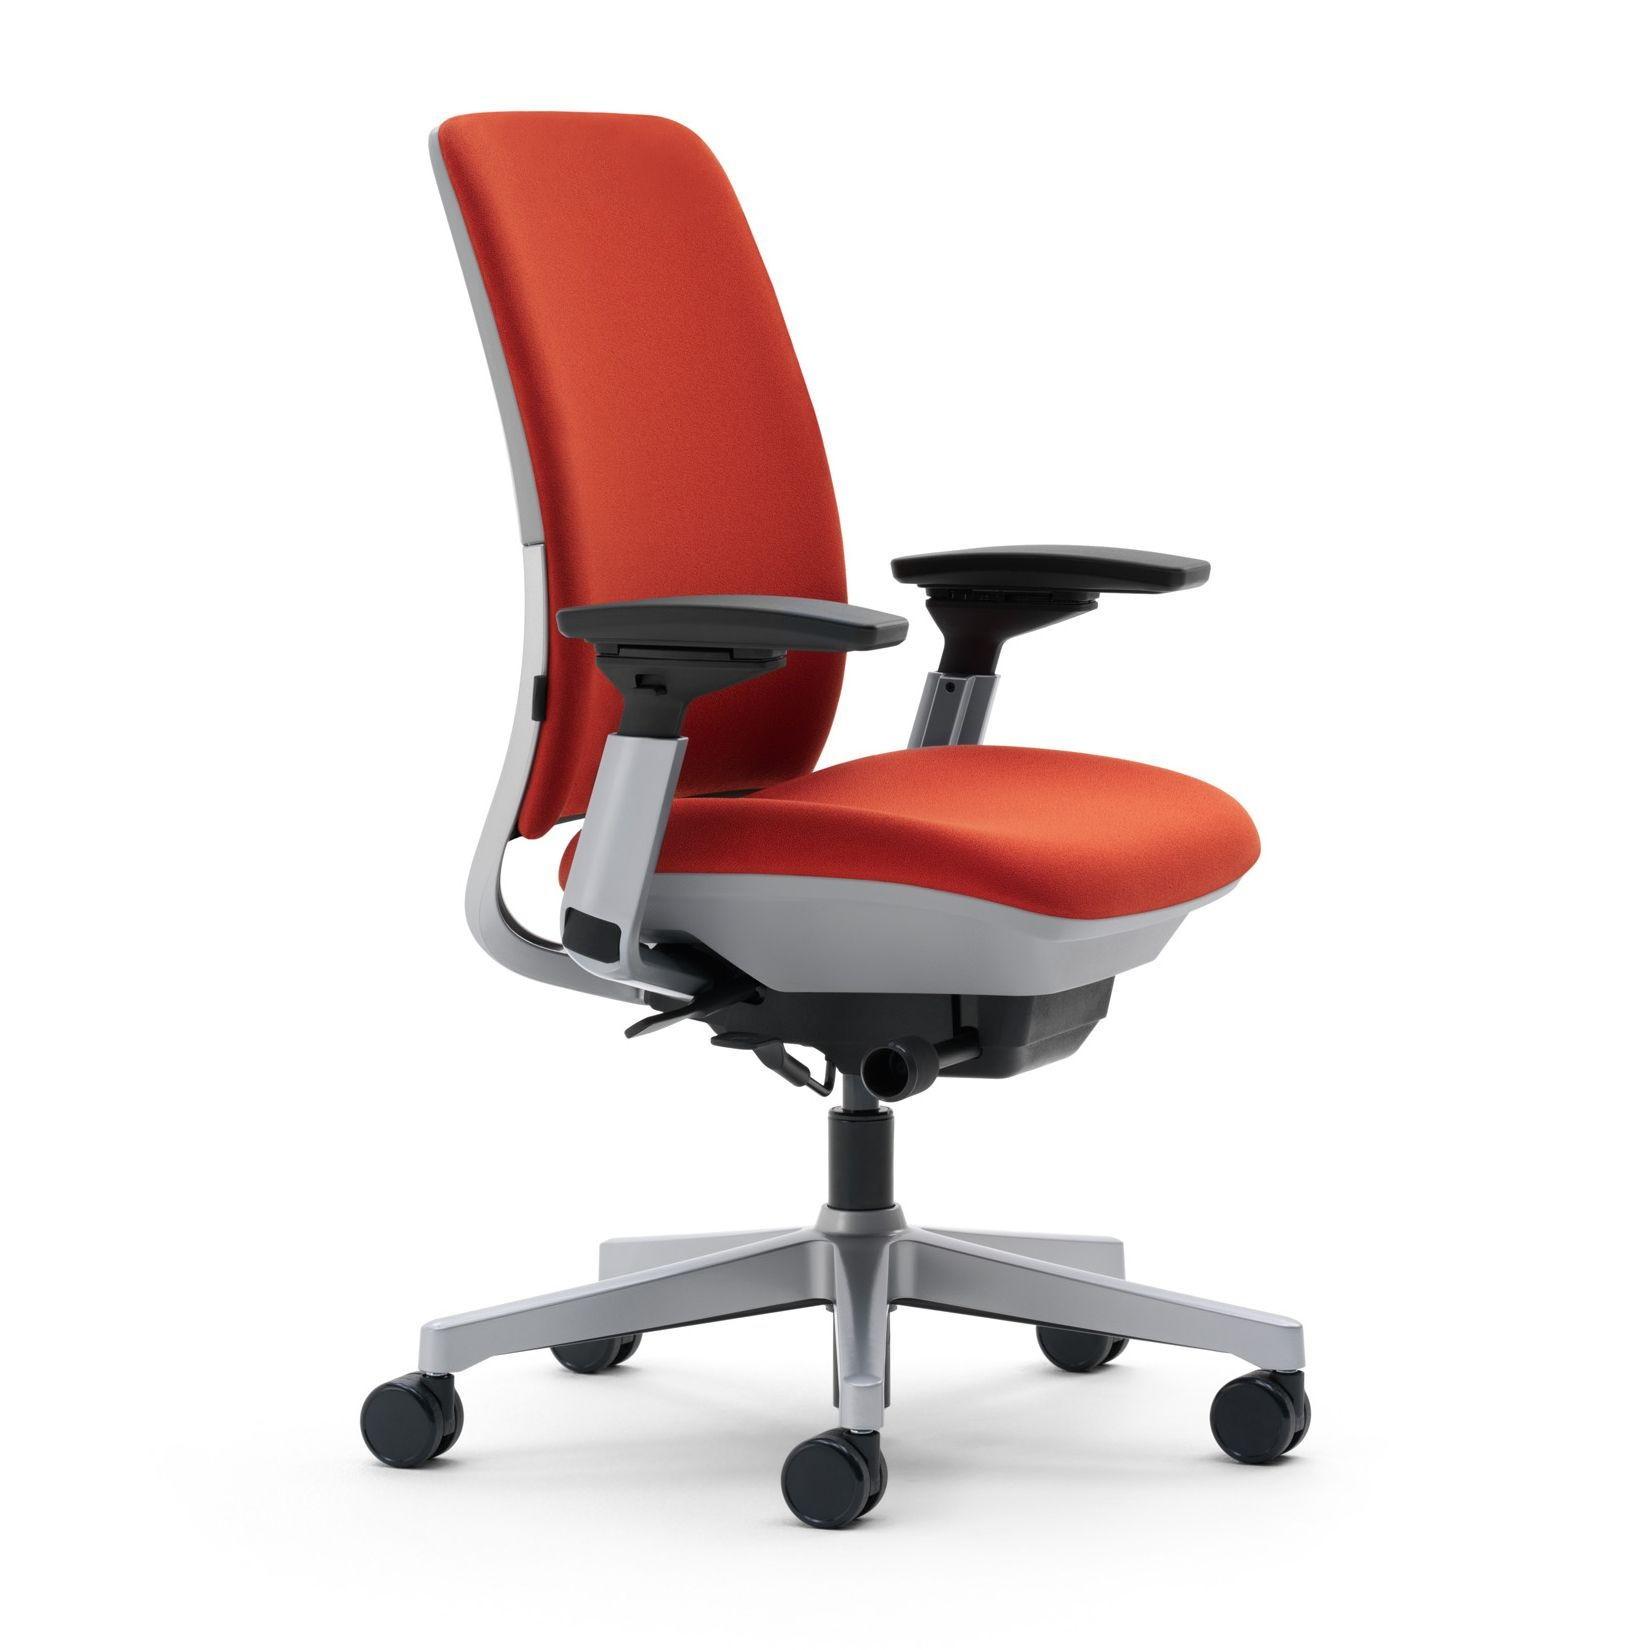 Steelcase gesture chair front - Steelcase Gesture Chair Front 21